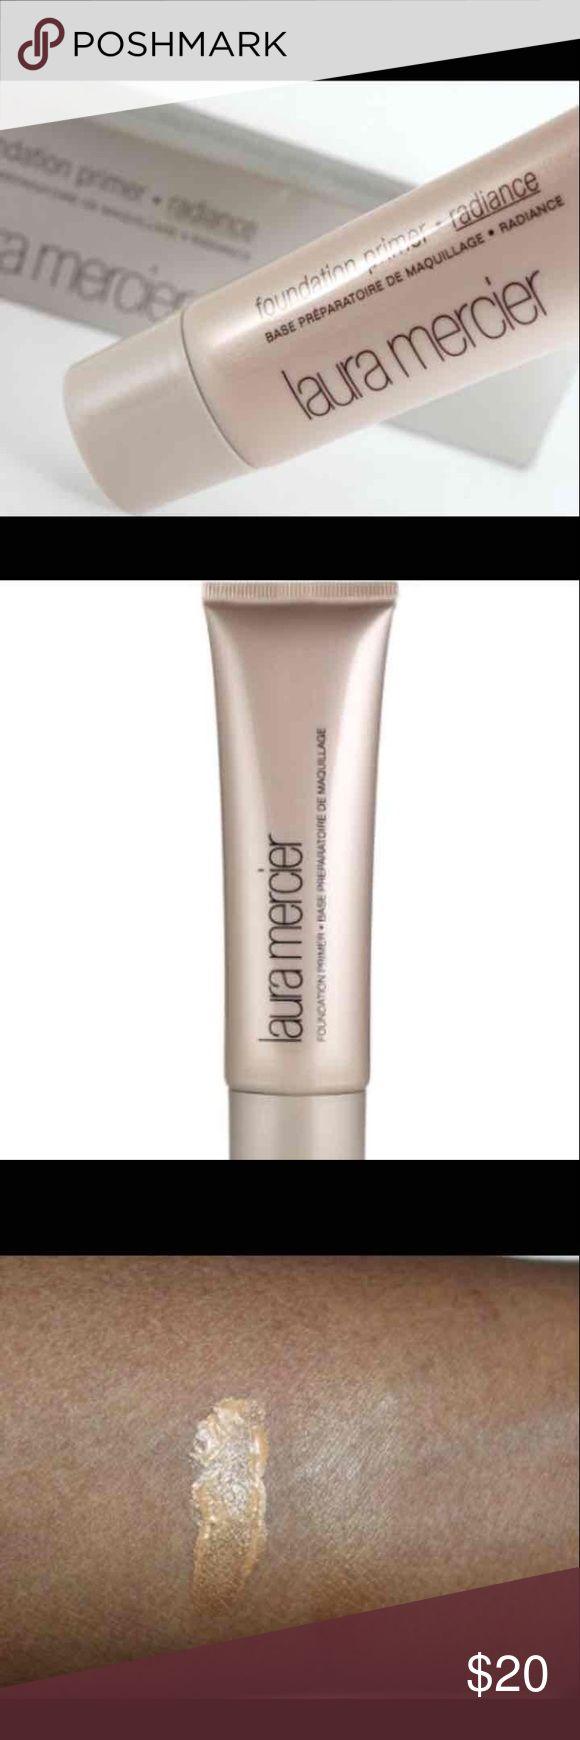 Brand new Laura Mercier Radiance Primer Brand new 1.7 oz of face primer. NO TRADES PLEASE Sephora Makeup Face Primer